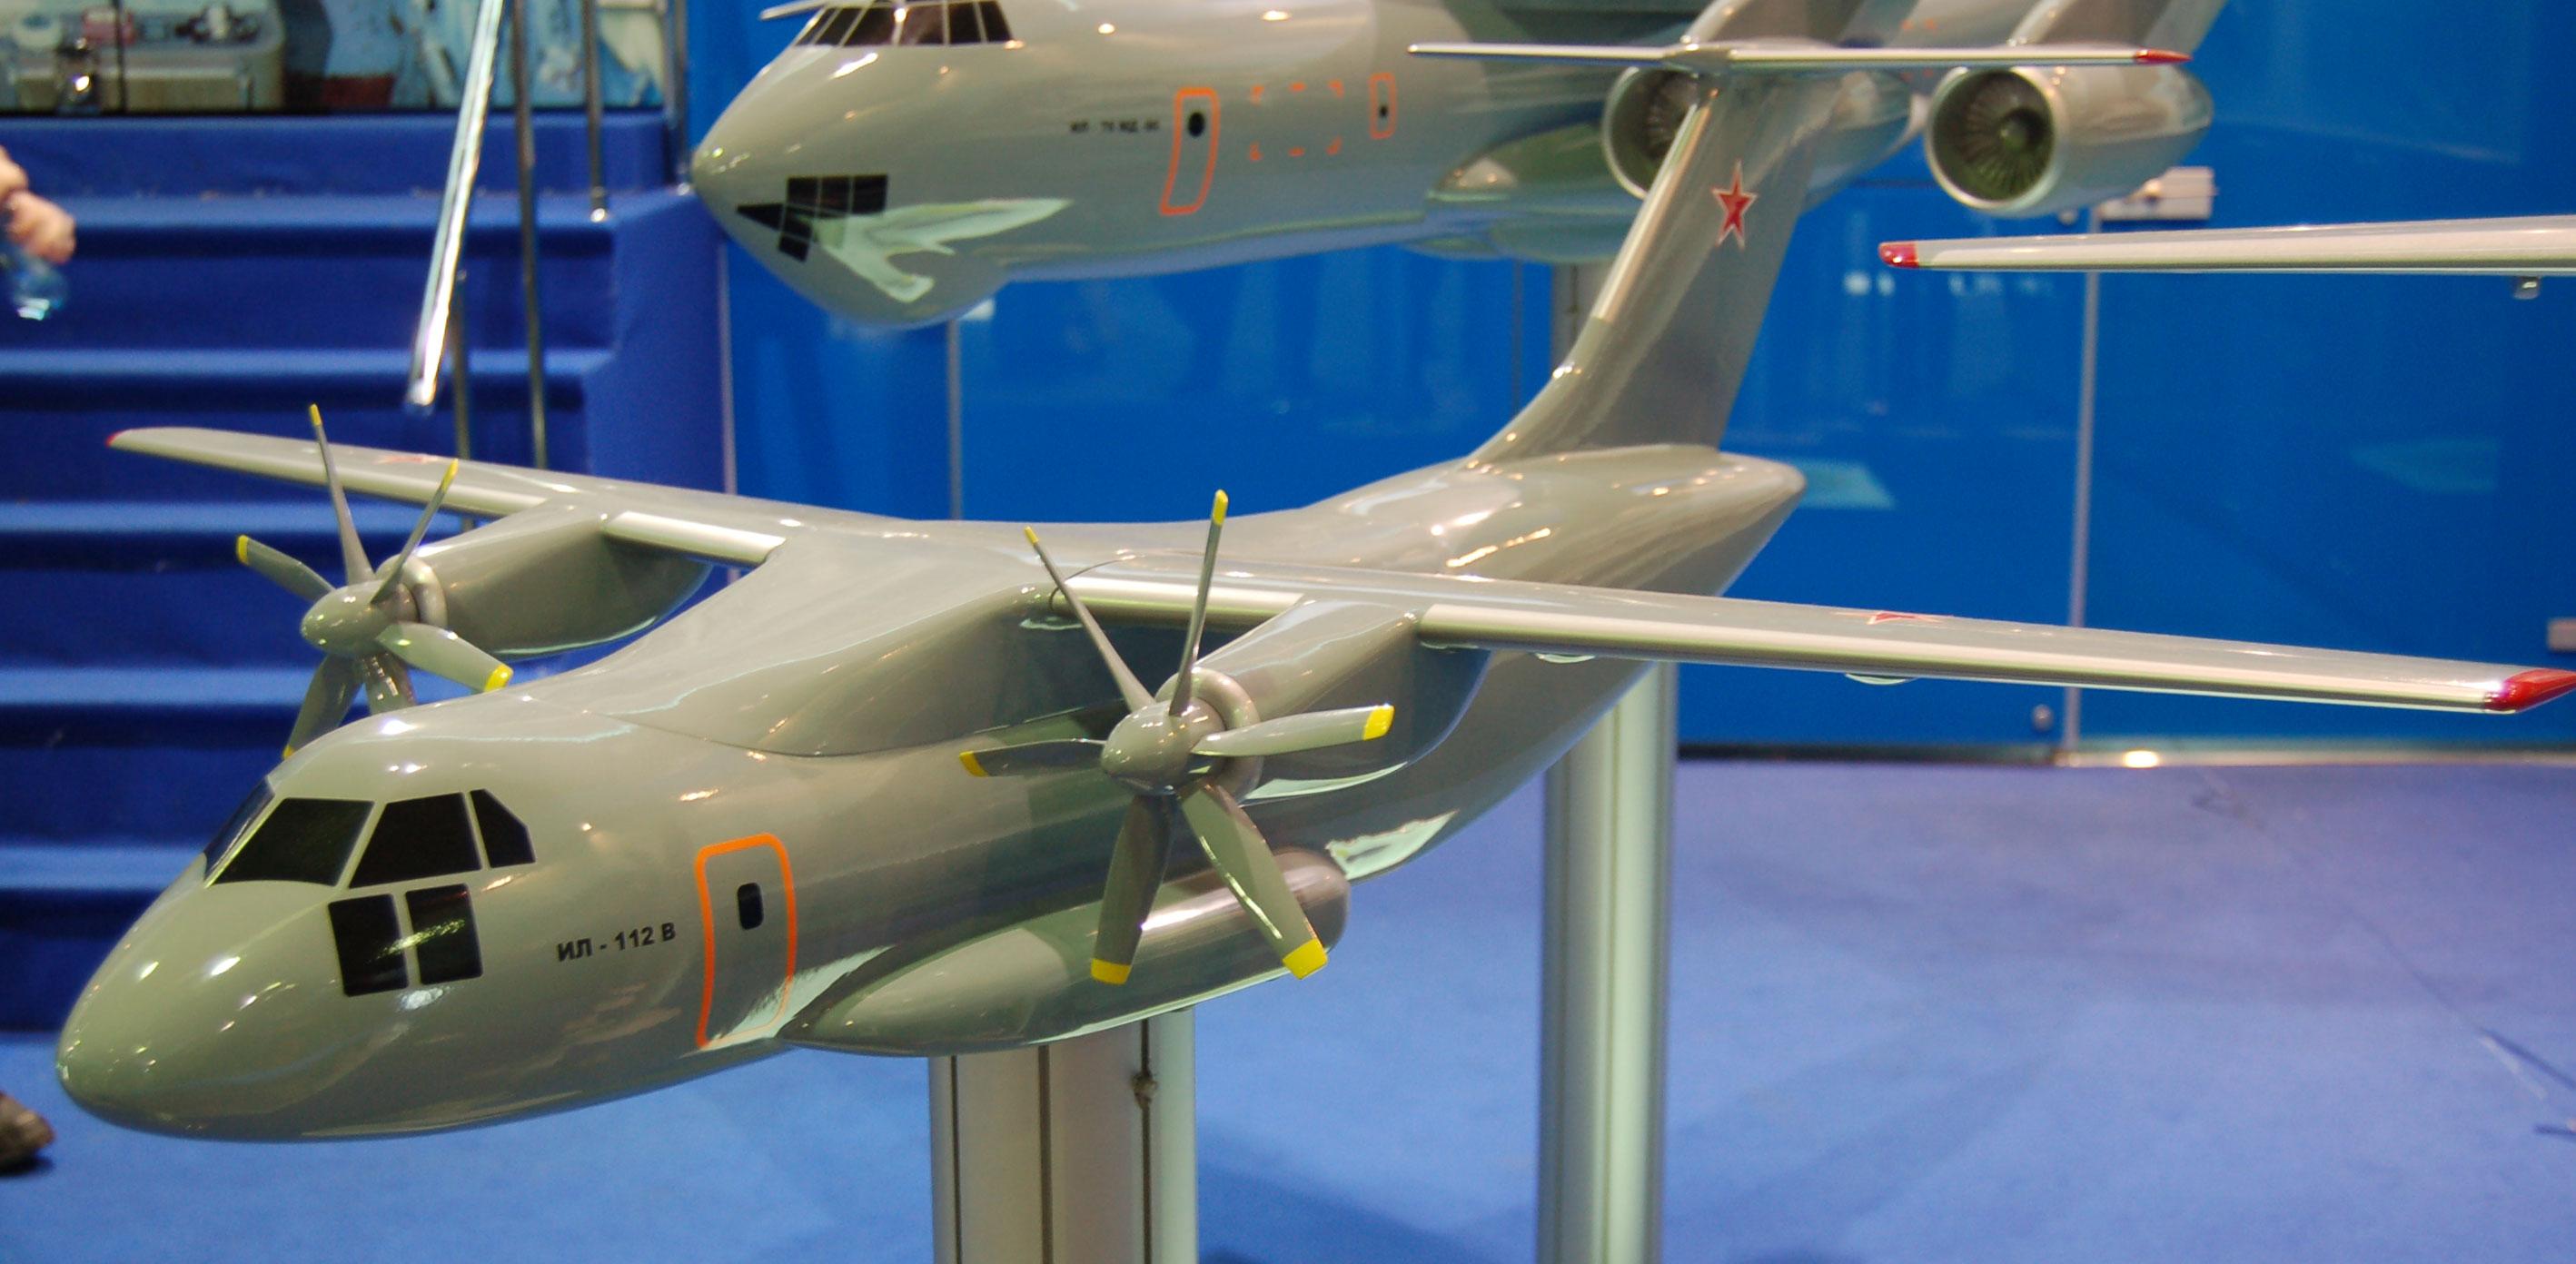 Il-112 aircraft.